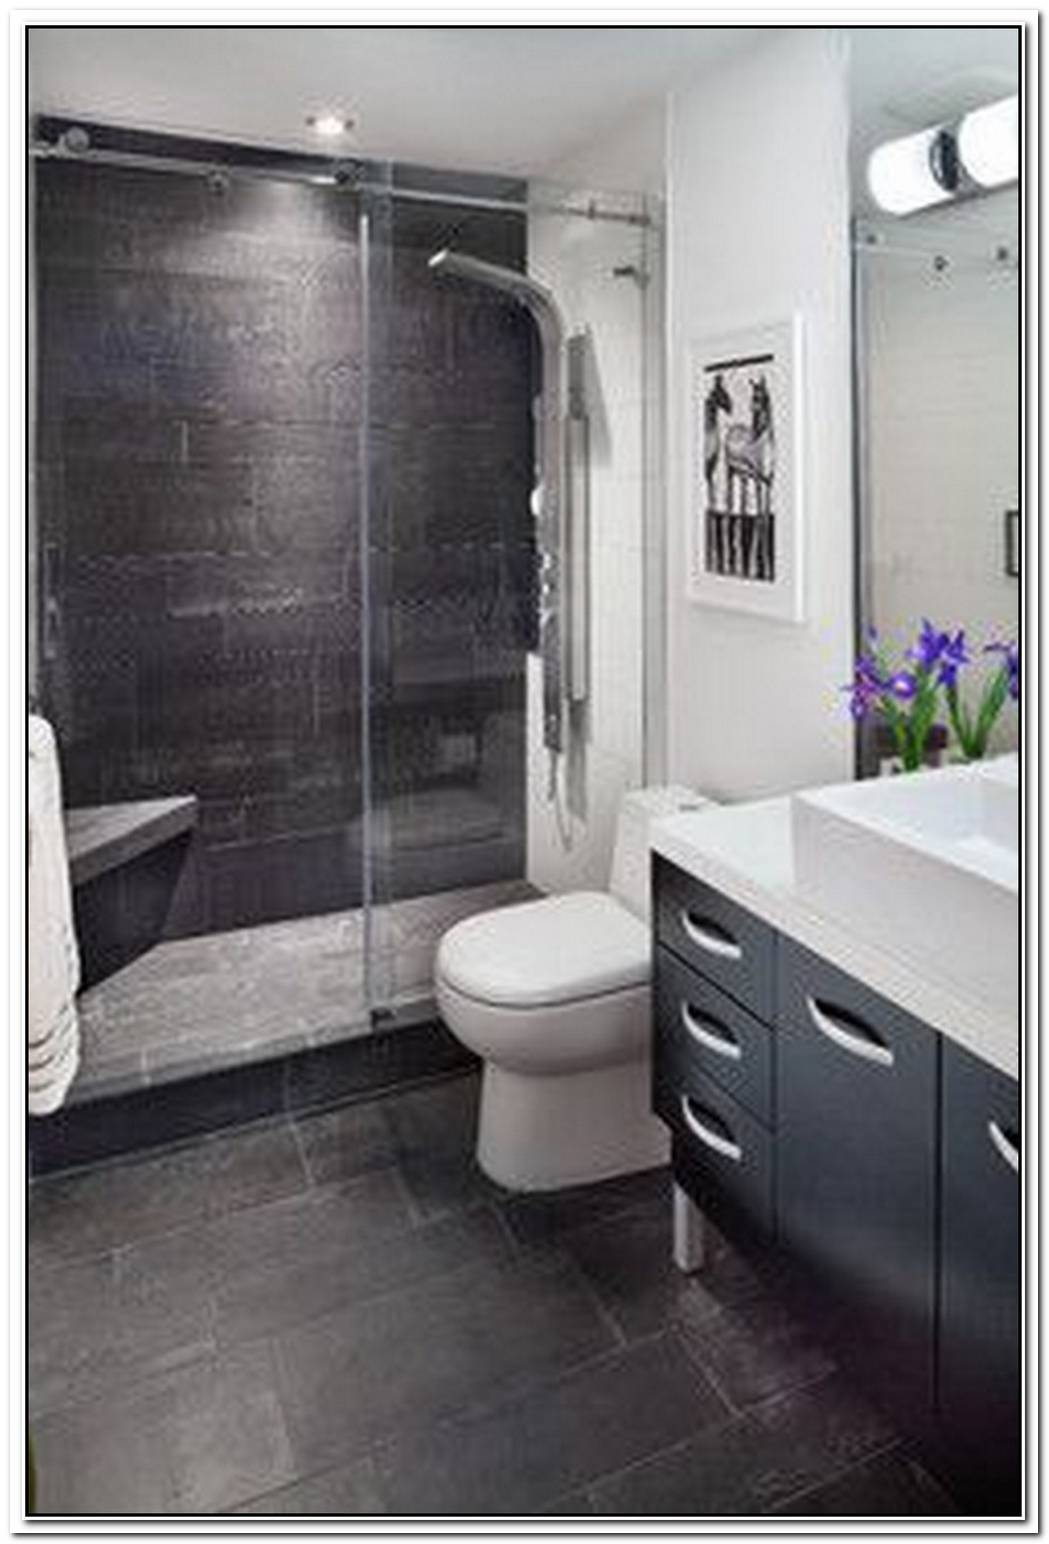 Condo Bathroom Modern Minimalist